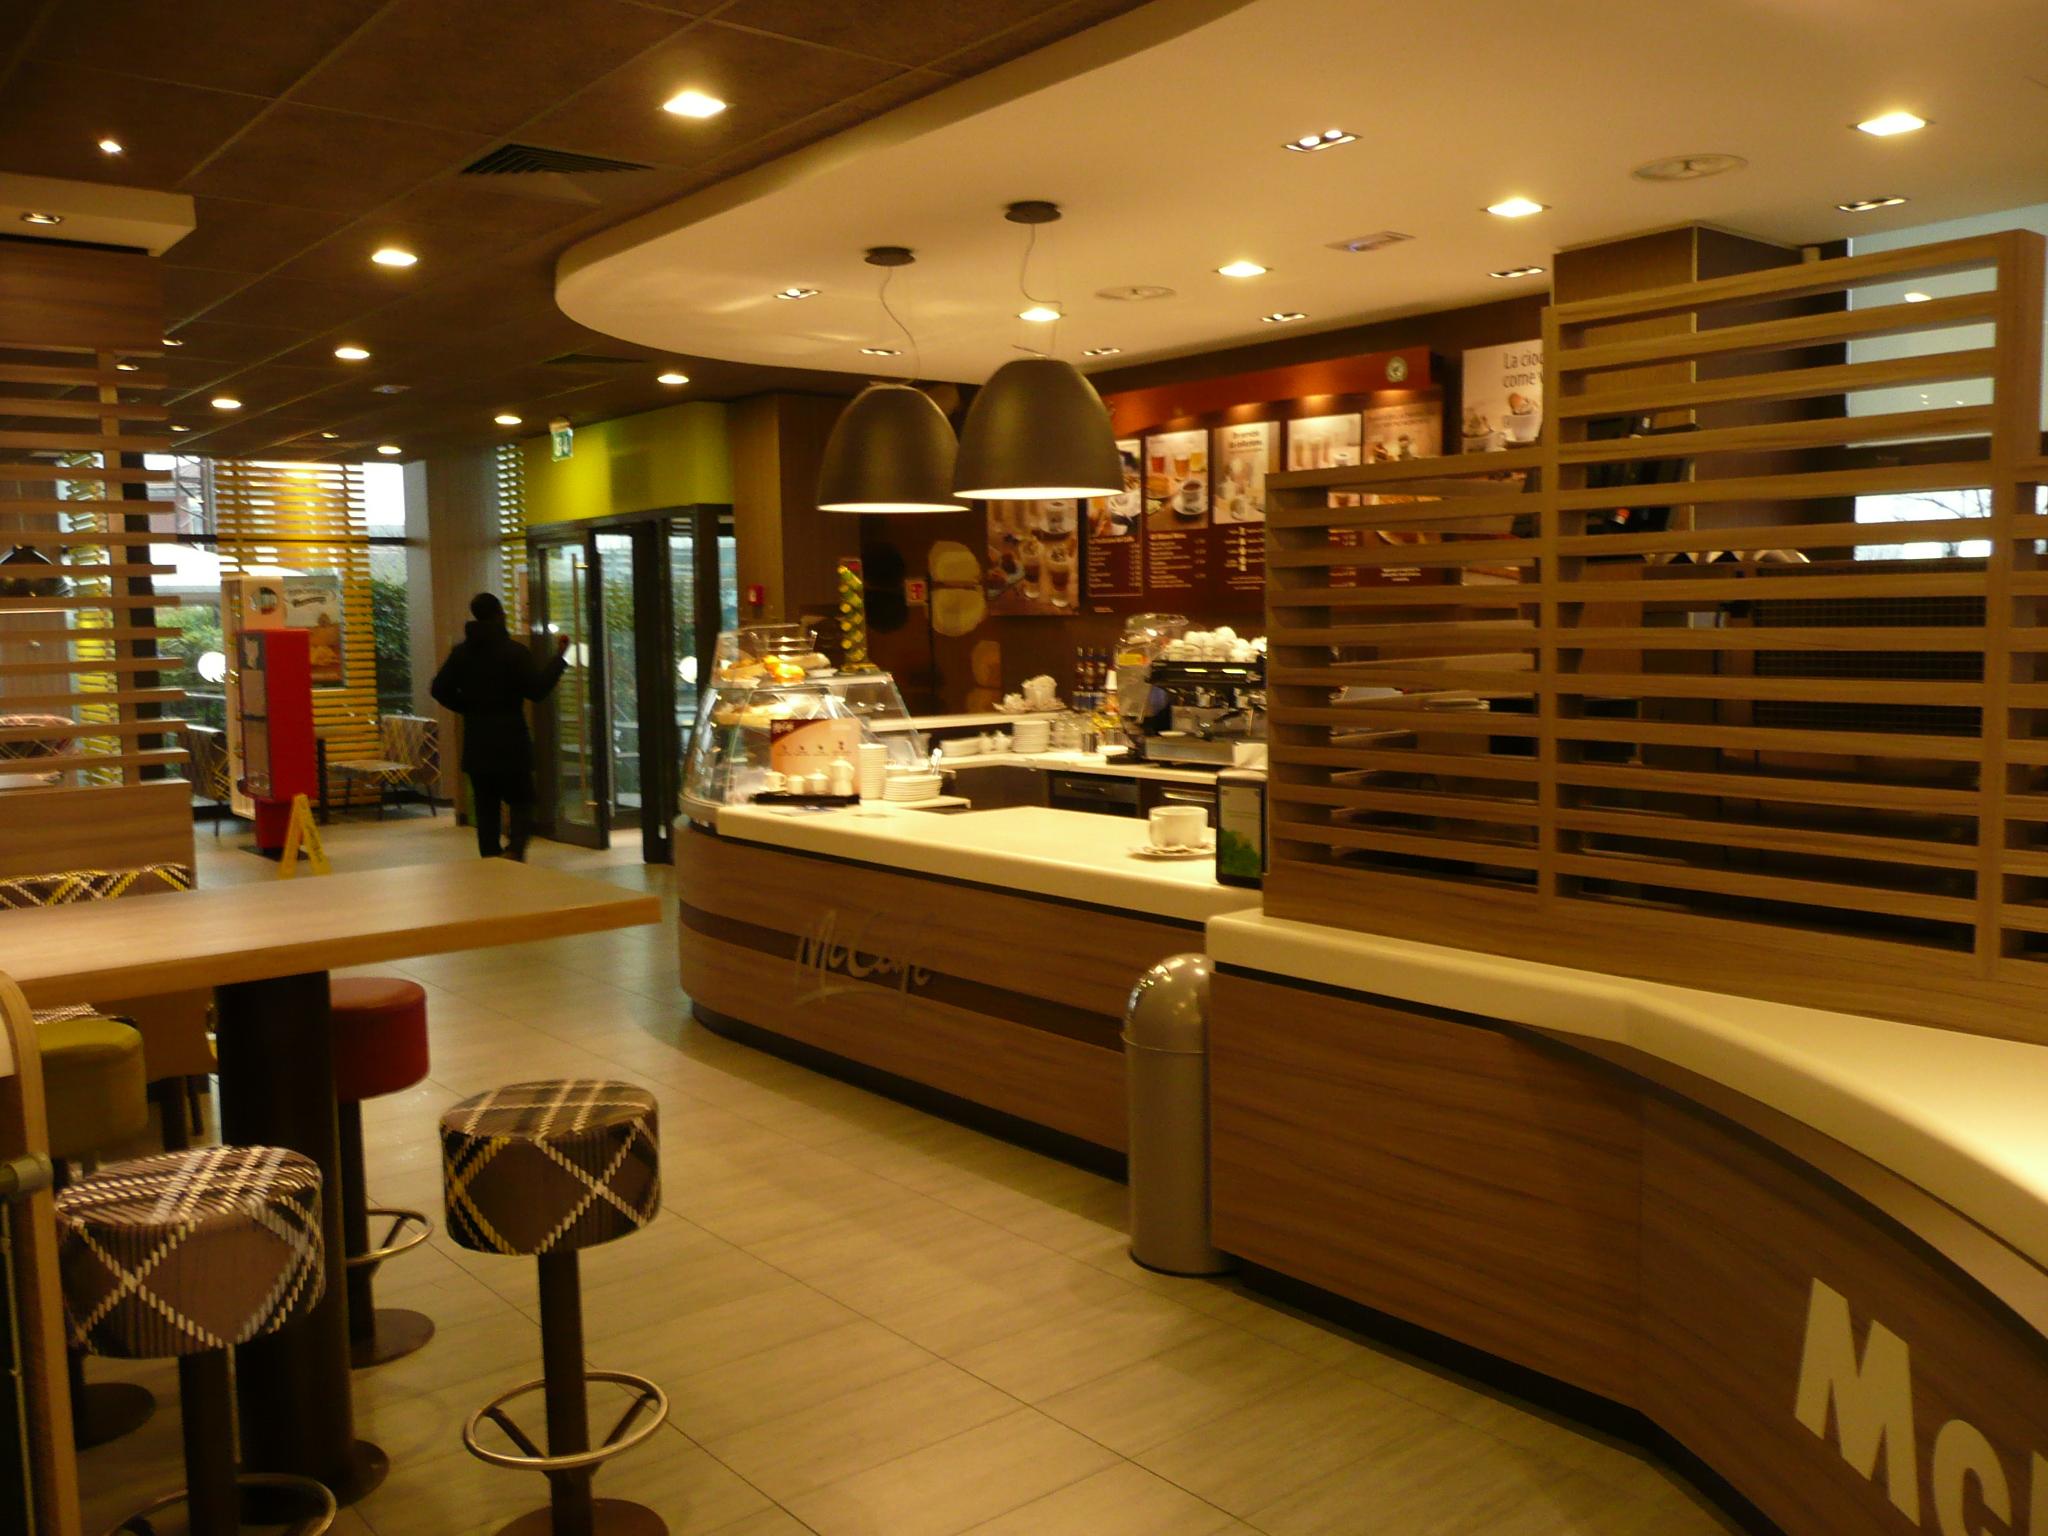 McCafe-Counter Modena Est- Arredamento bar e ristoranti